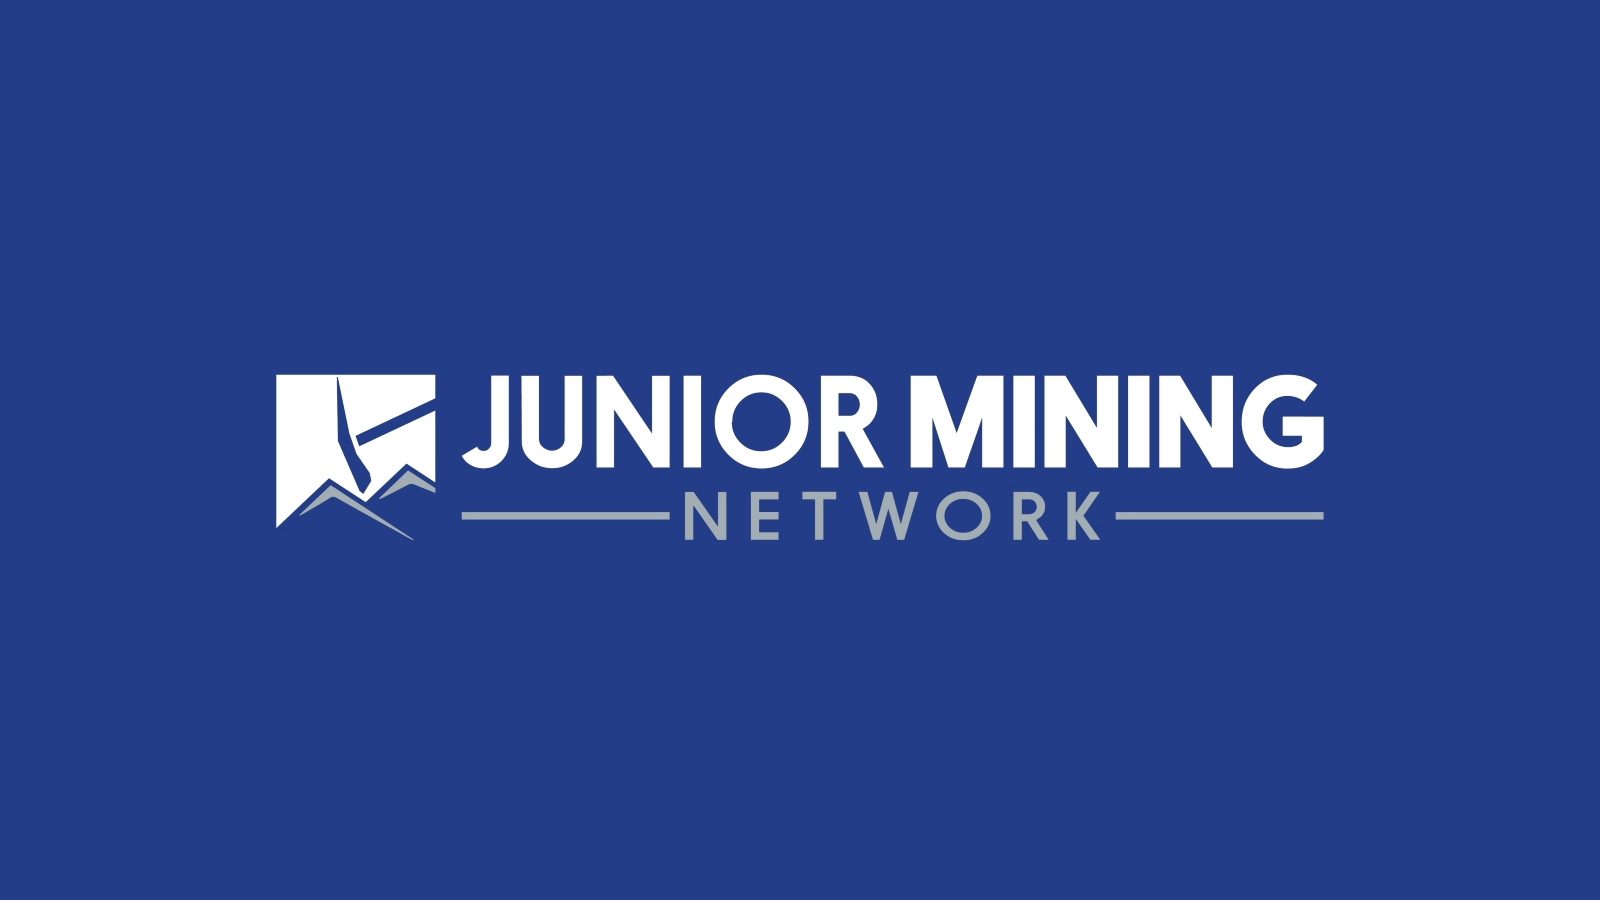 El Domo Drill Hole Locations - 2020 01 13 News Release - Adventus Mining Corporation (ADZN - tsxv) (CNW Group/Adventus Mining Corporation)